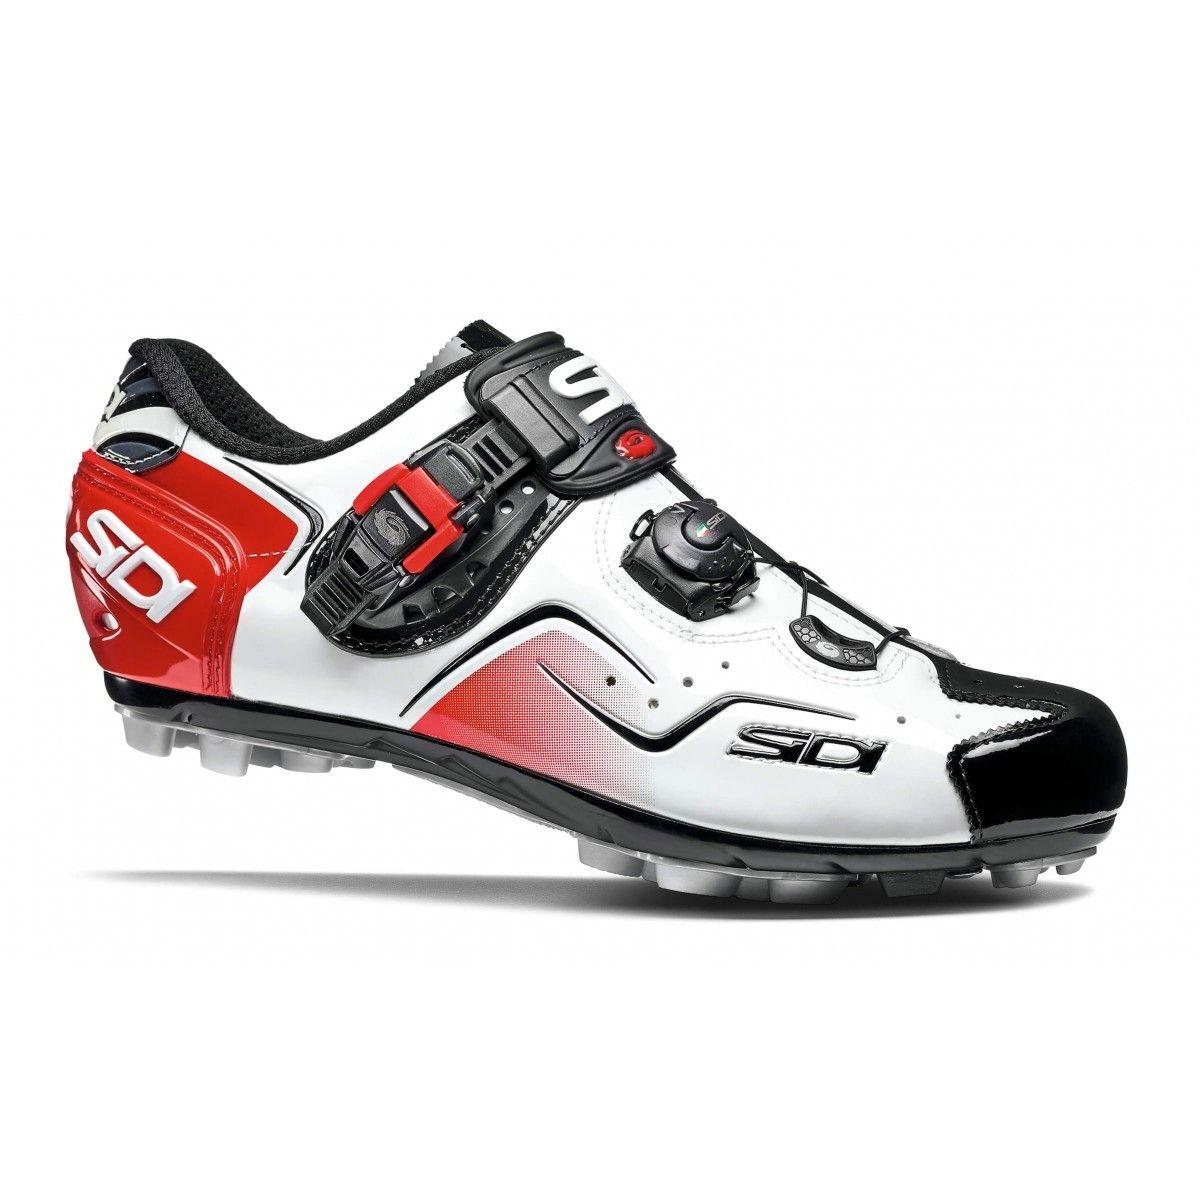 Chaussures VTT CAPE Running Trail Sidi